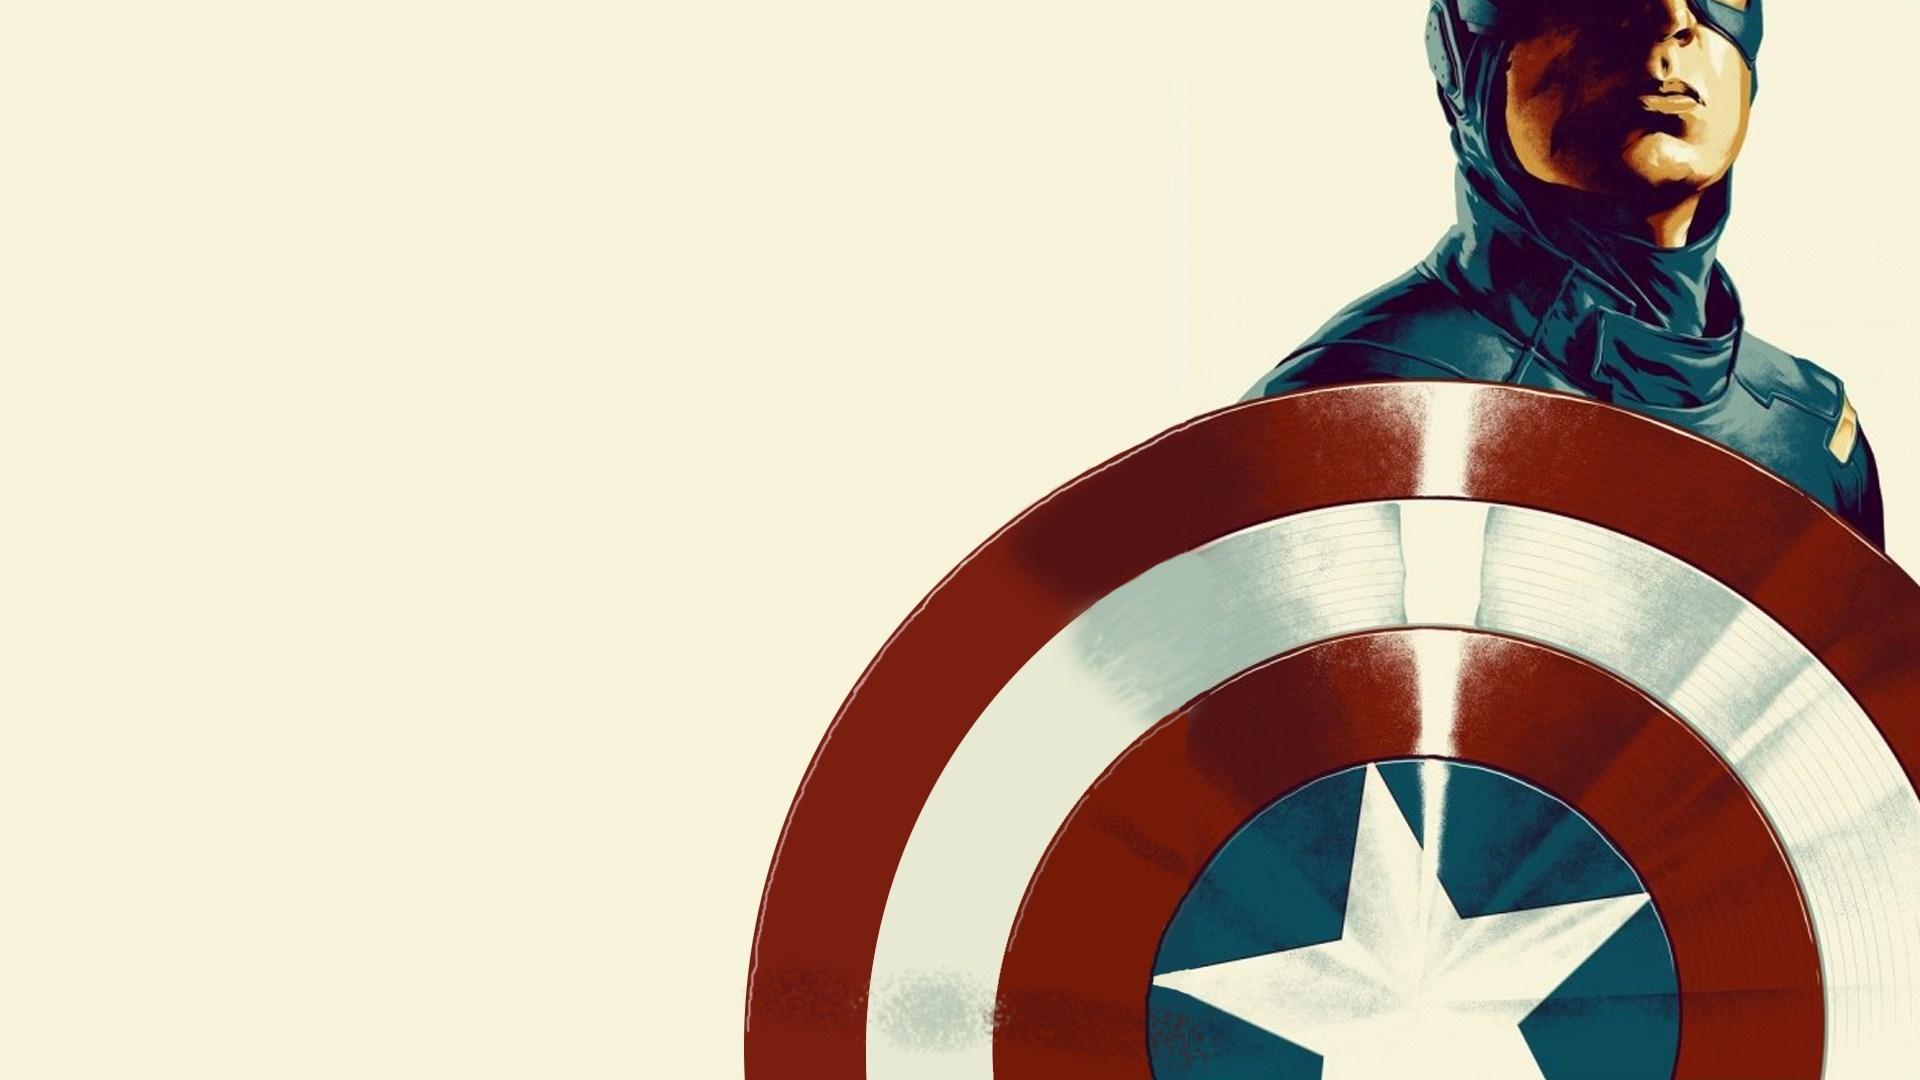 Captain America Shield Poster Art